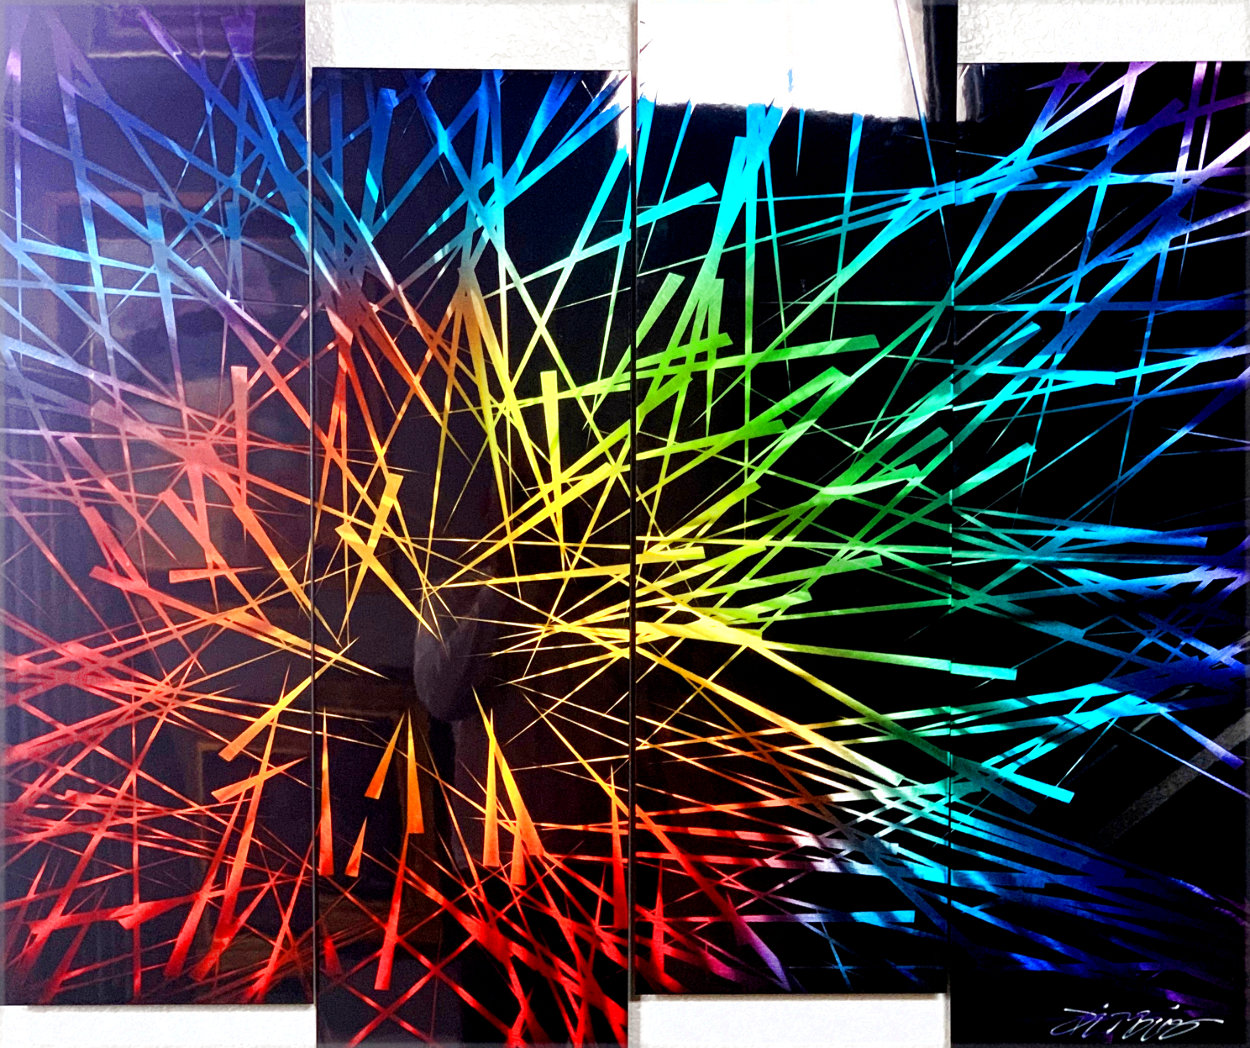 Spectrum 2020 36x48 Unique - Huge Other by Chris DeRubeis